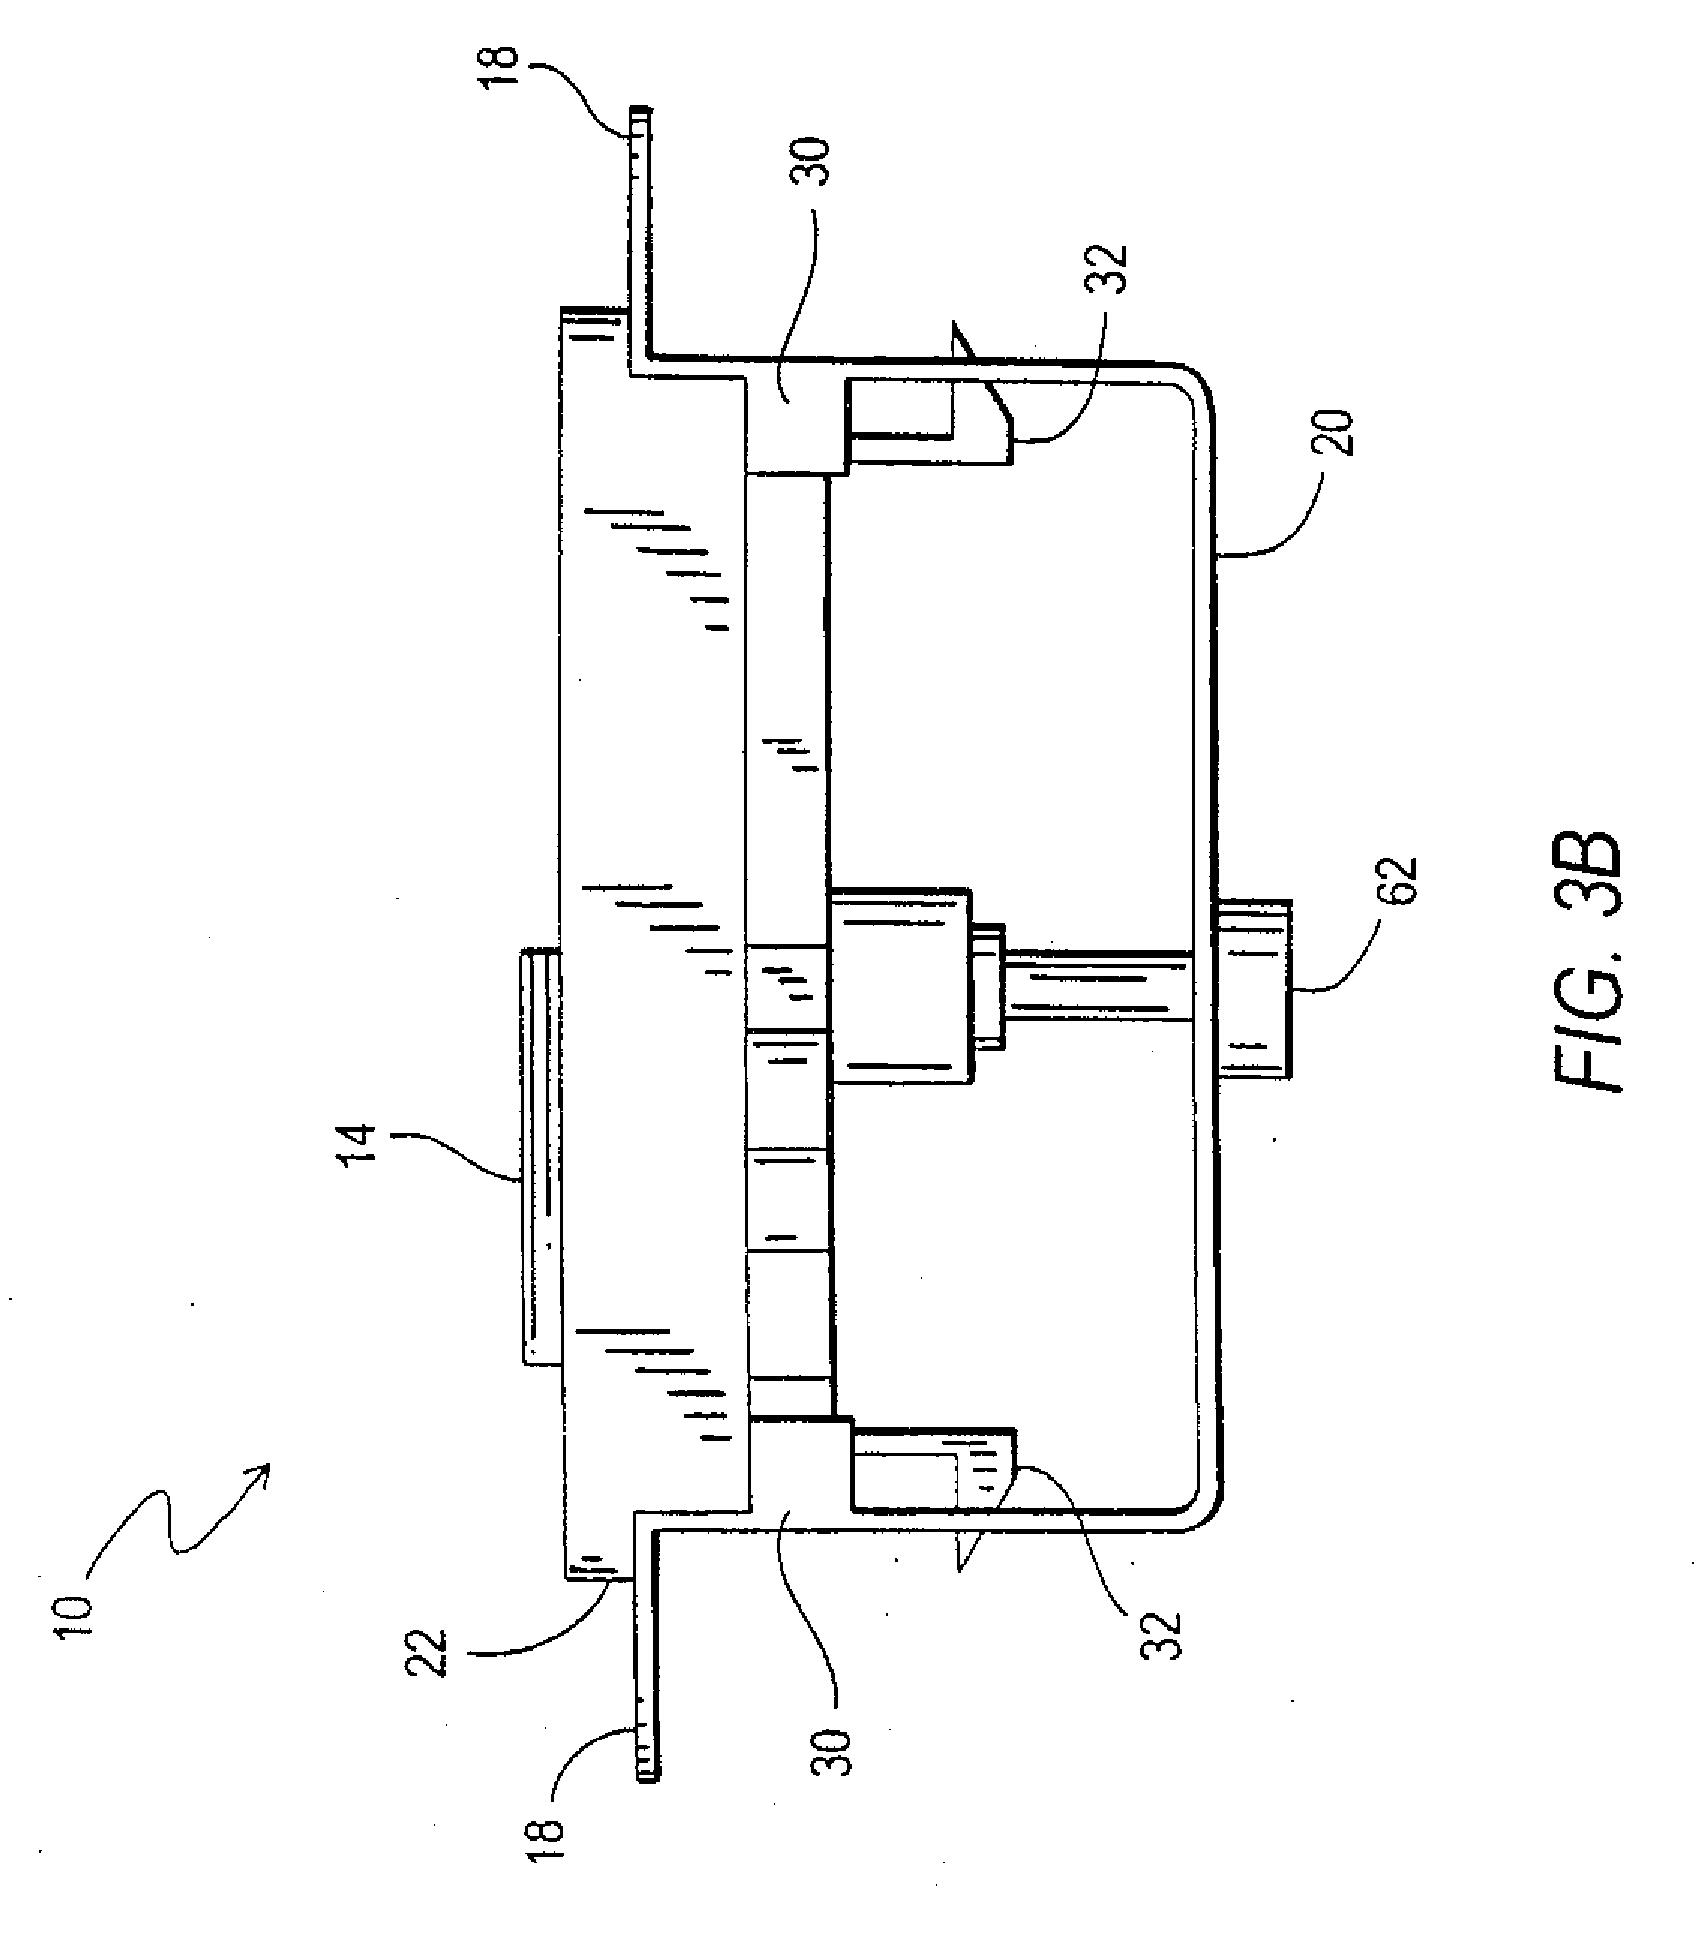 专利us20070026701 - electrical